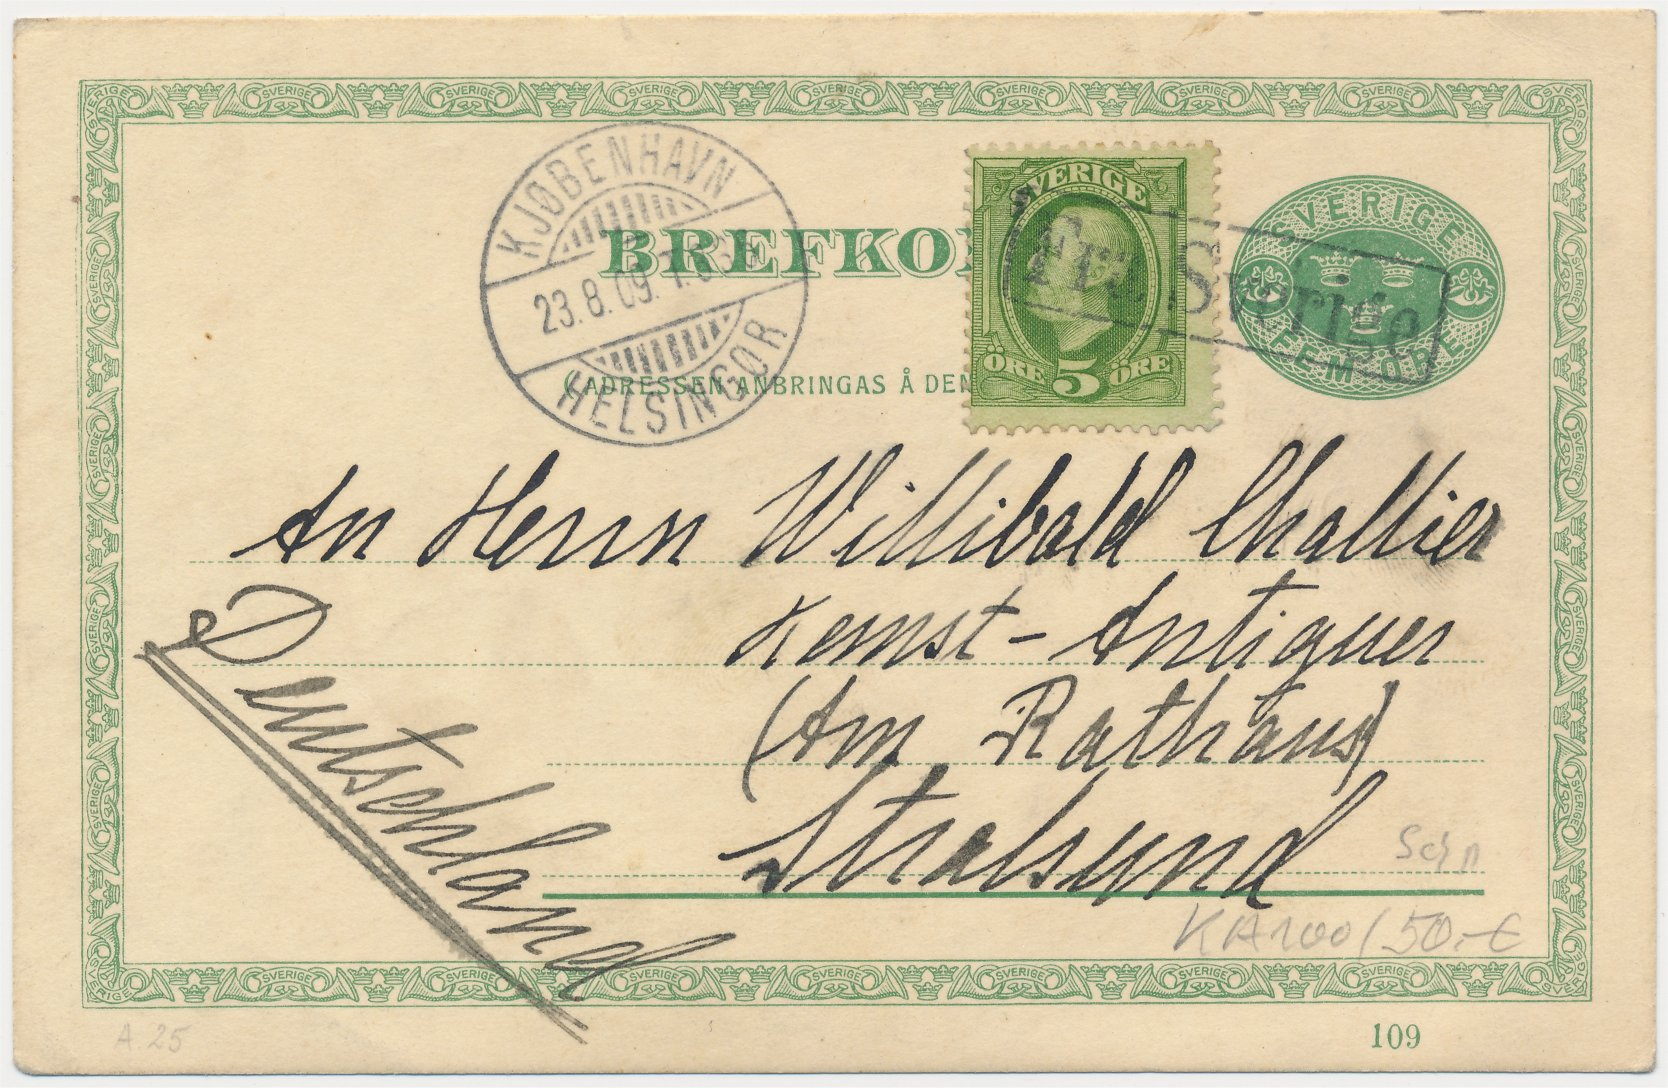 10_brevkort_fra_sverige_23_7_1909